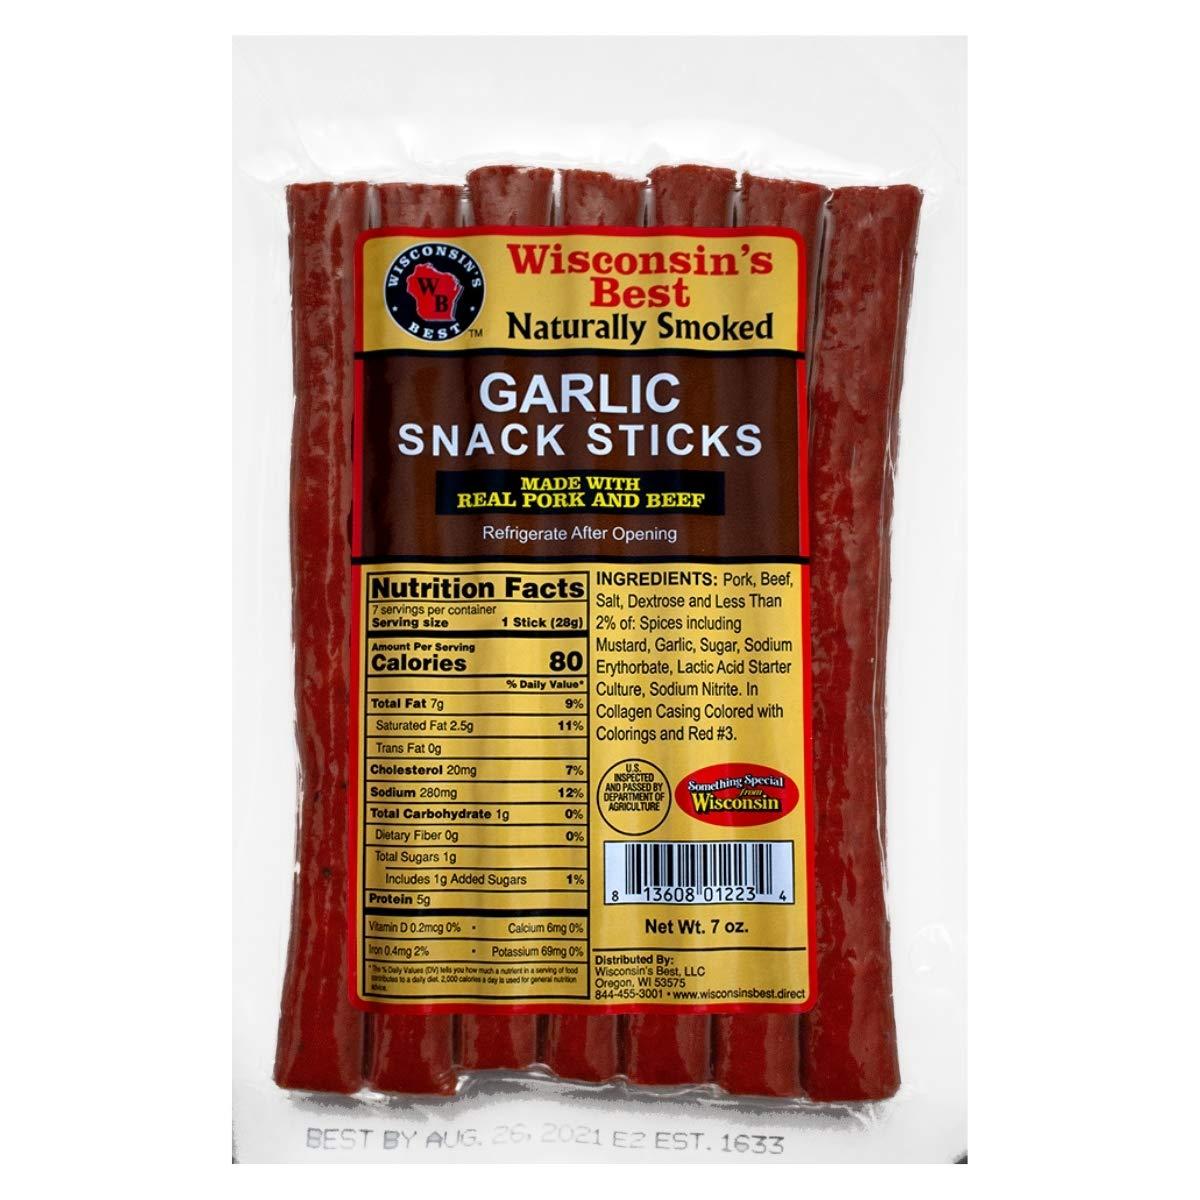 Wisconsin's Best Garlic Protein Snack 7 2021 model Purchase 1 Sticks Meat oz